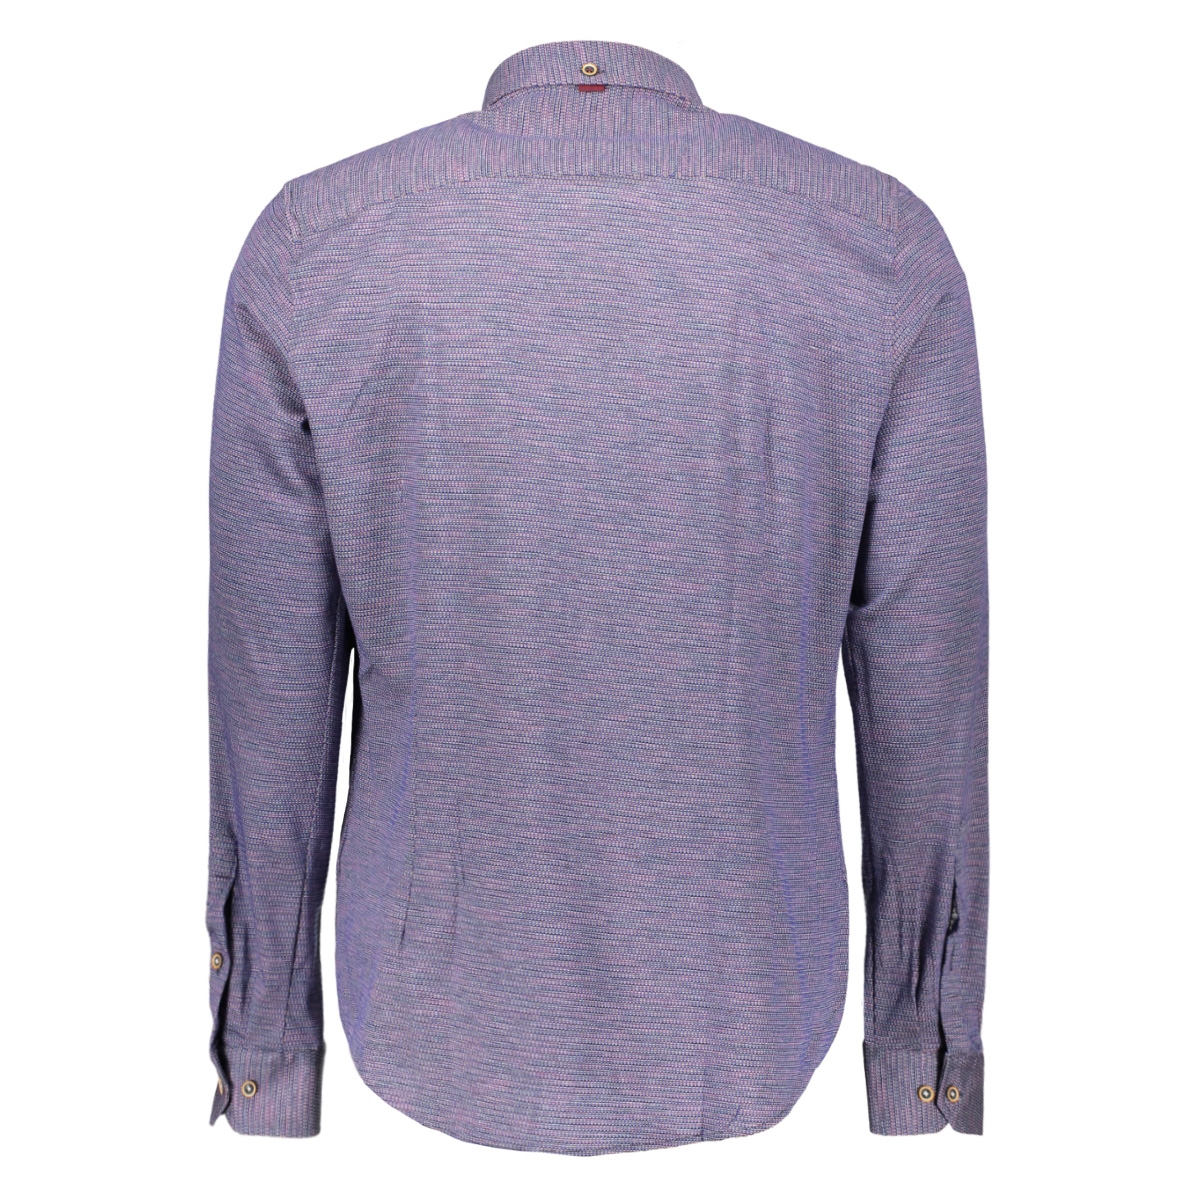 srt009 companeros overhemd 01red